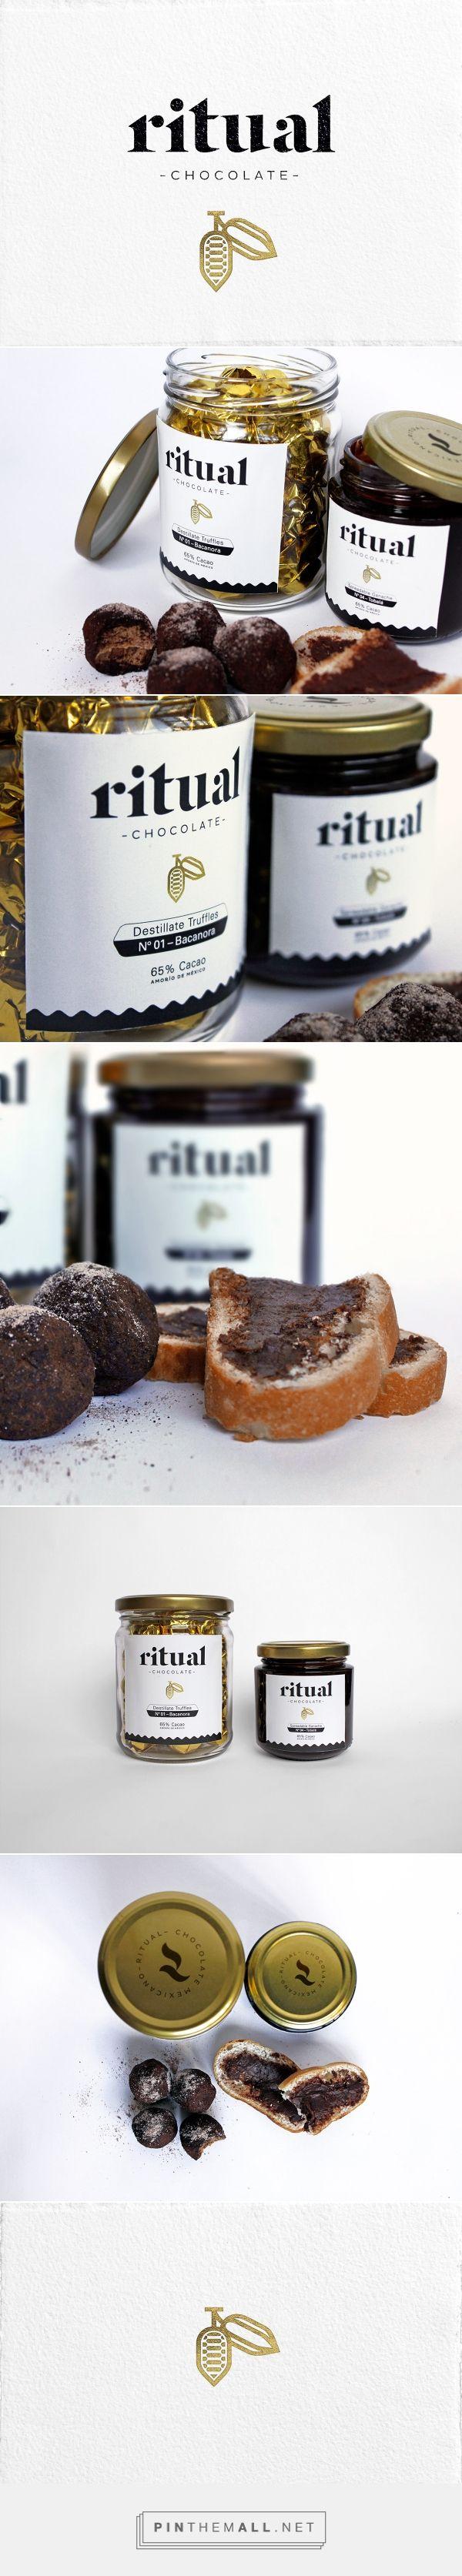 Ritual /  mexican chocolate brand by path-studio